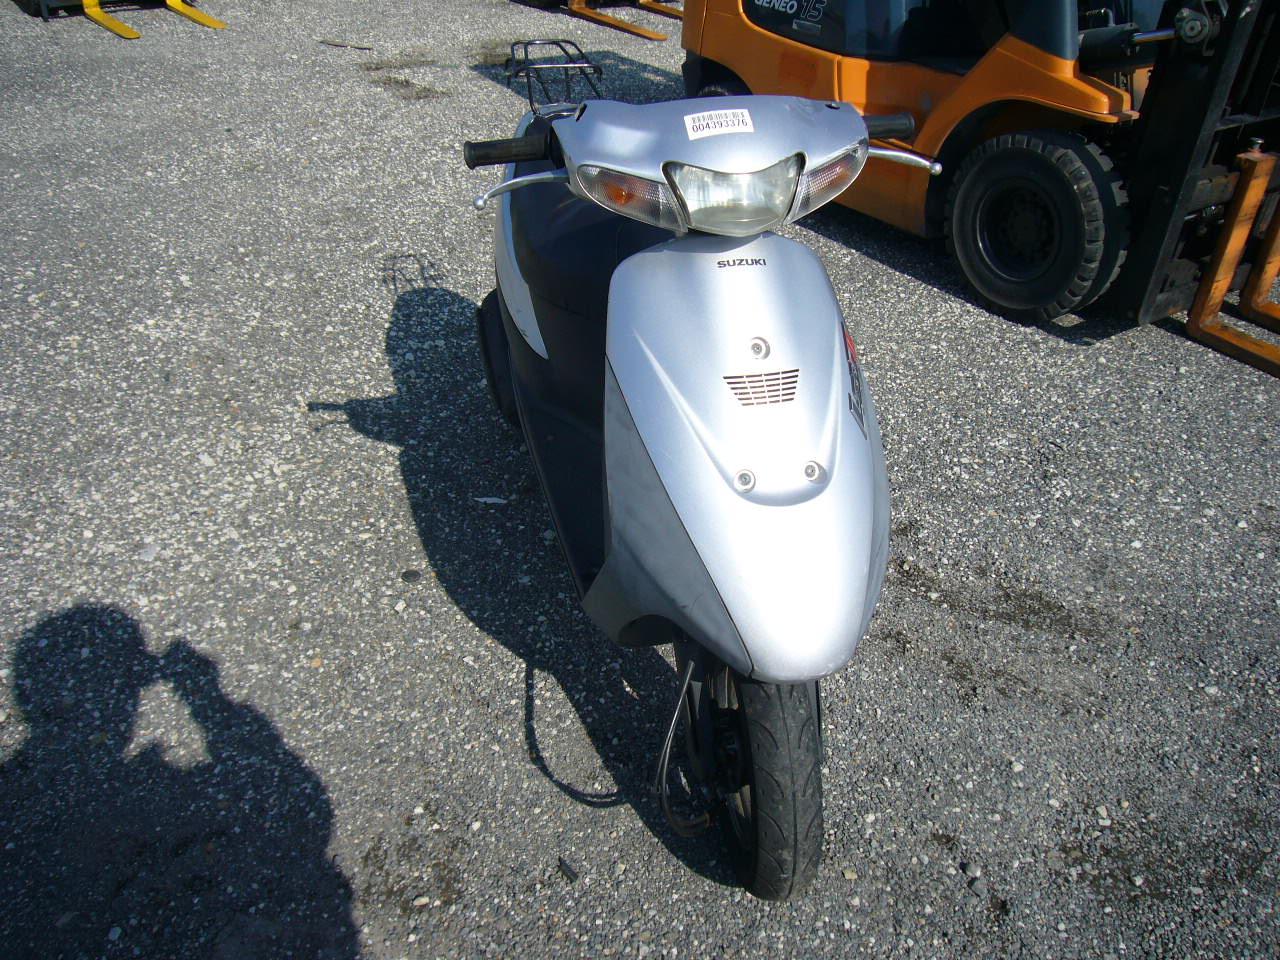 Ремонт скутера suzuki своими руками